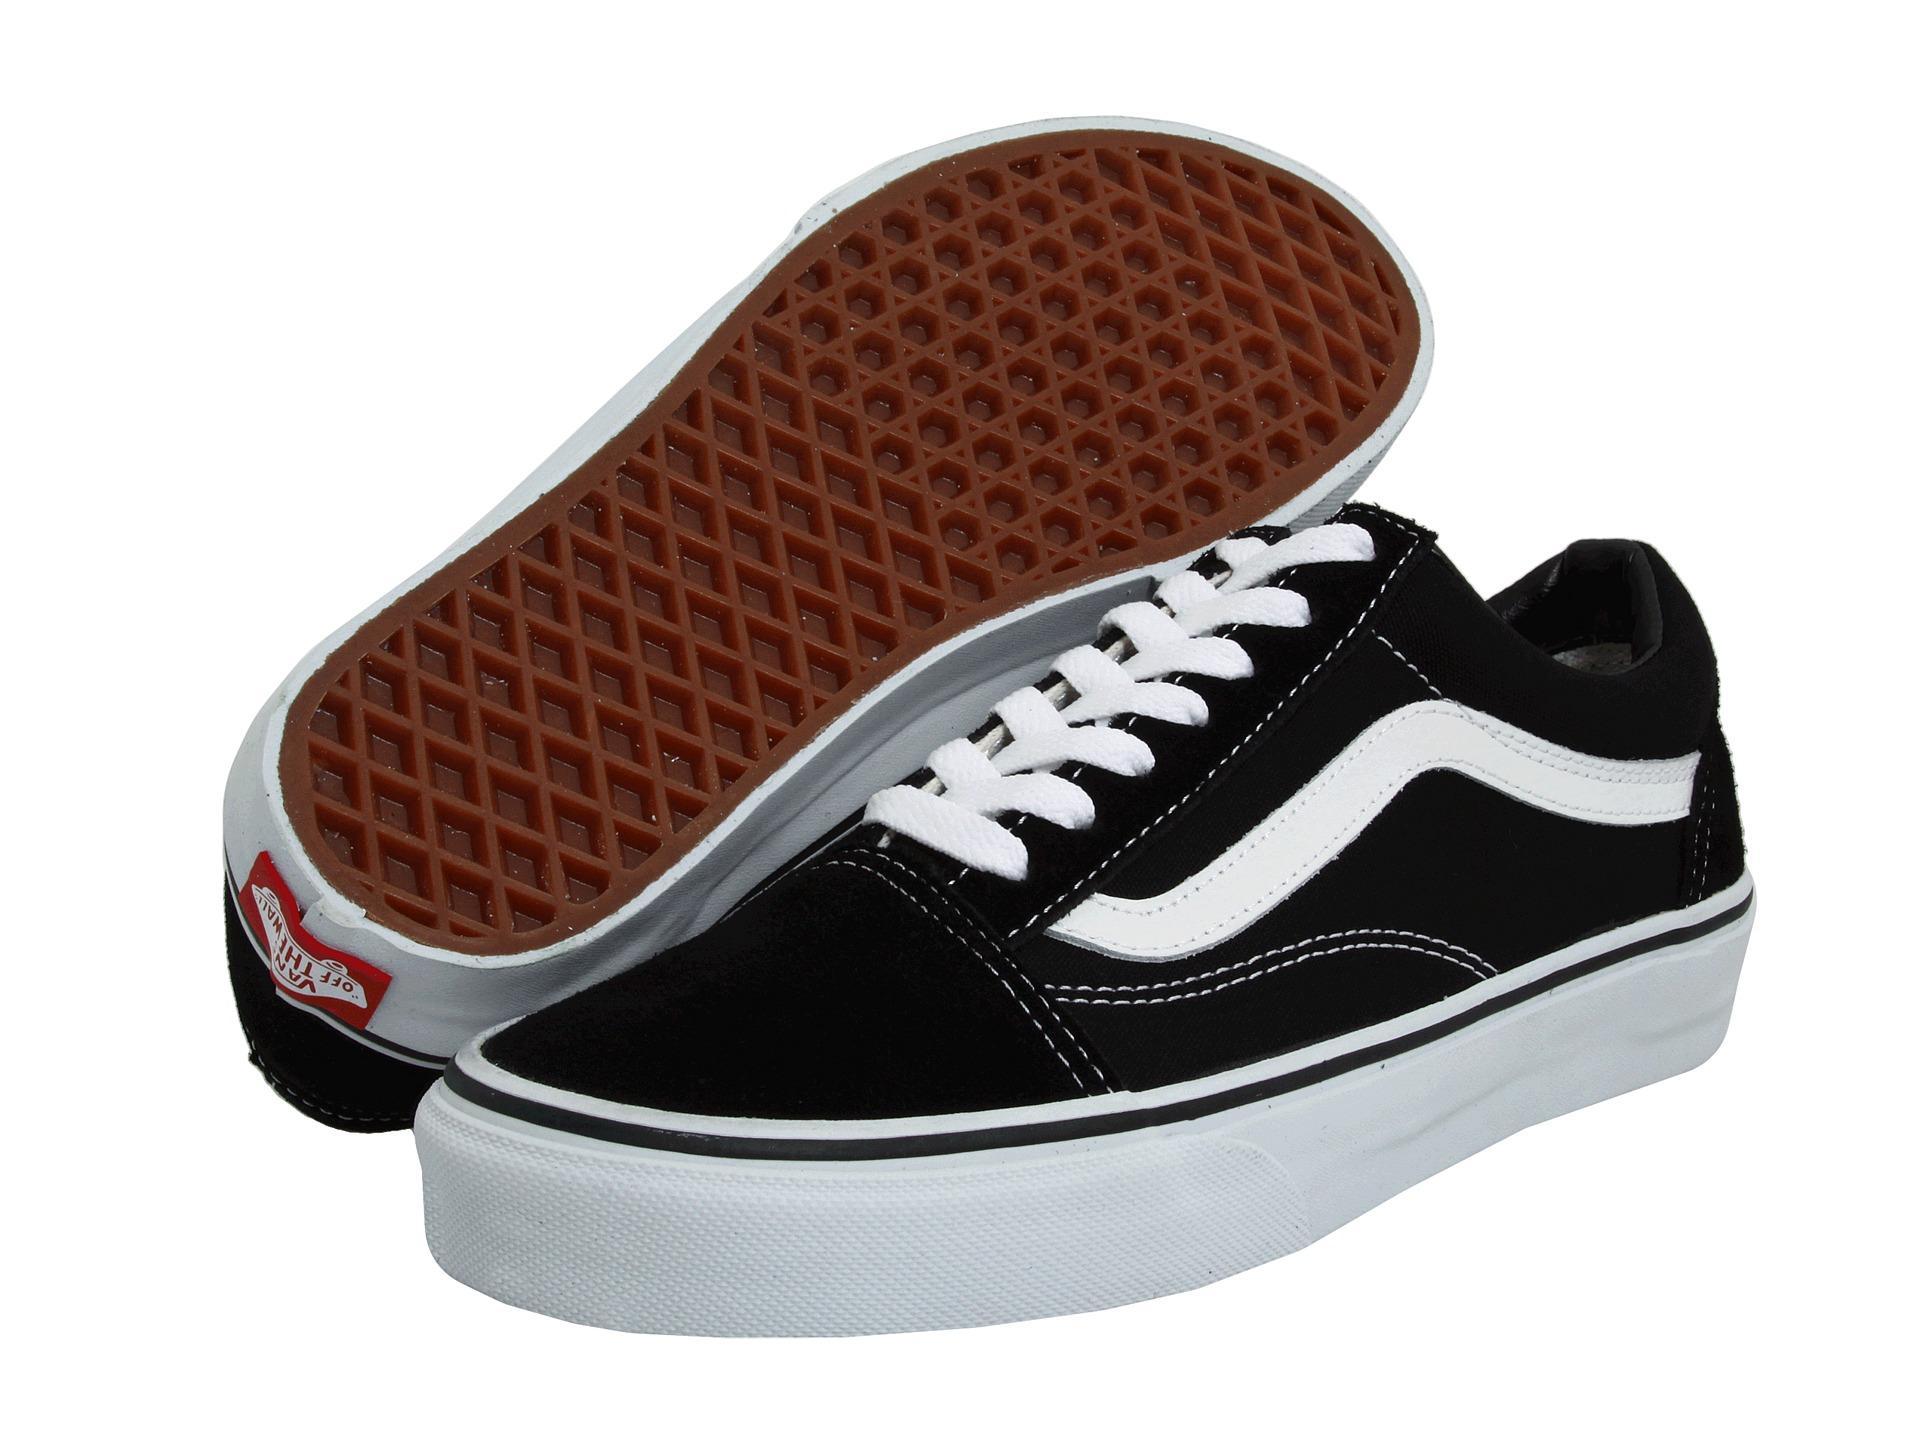 sepatu sneakers Vns old school  stret style unisex-hitam lis putih